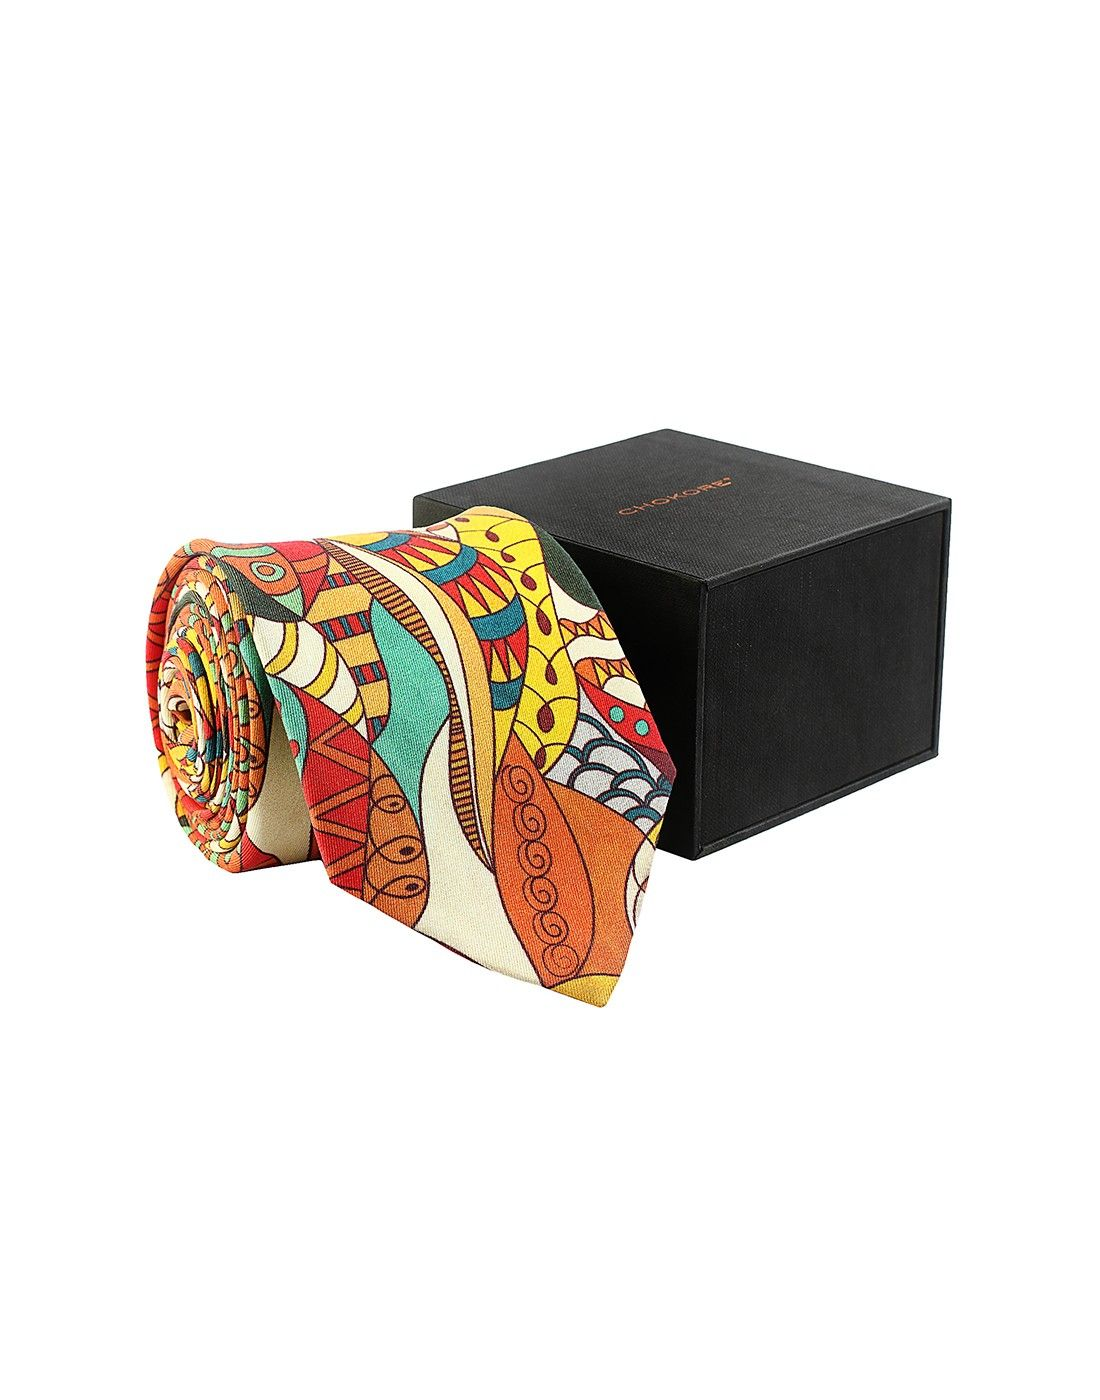 Multicoloured Silk Tie - Tie - Shop By Product - Fashion Accessories